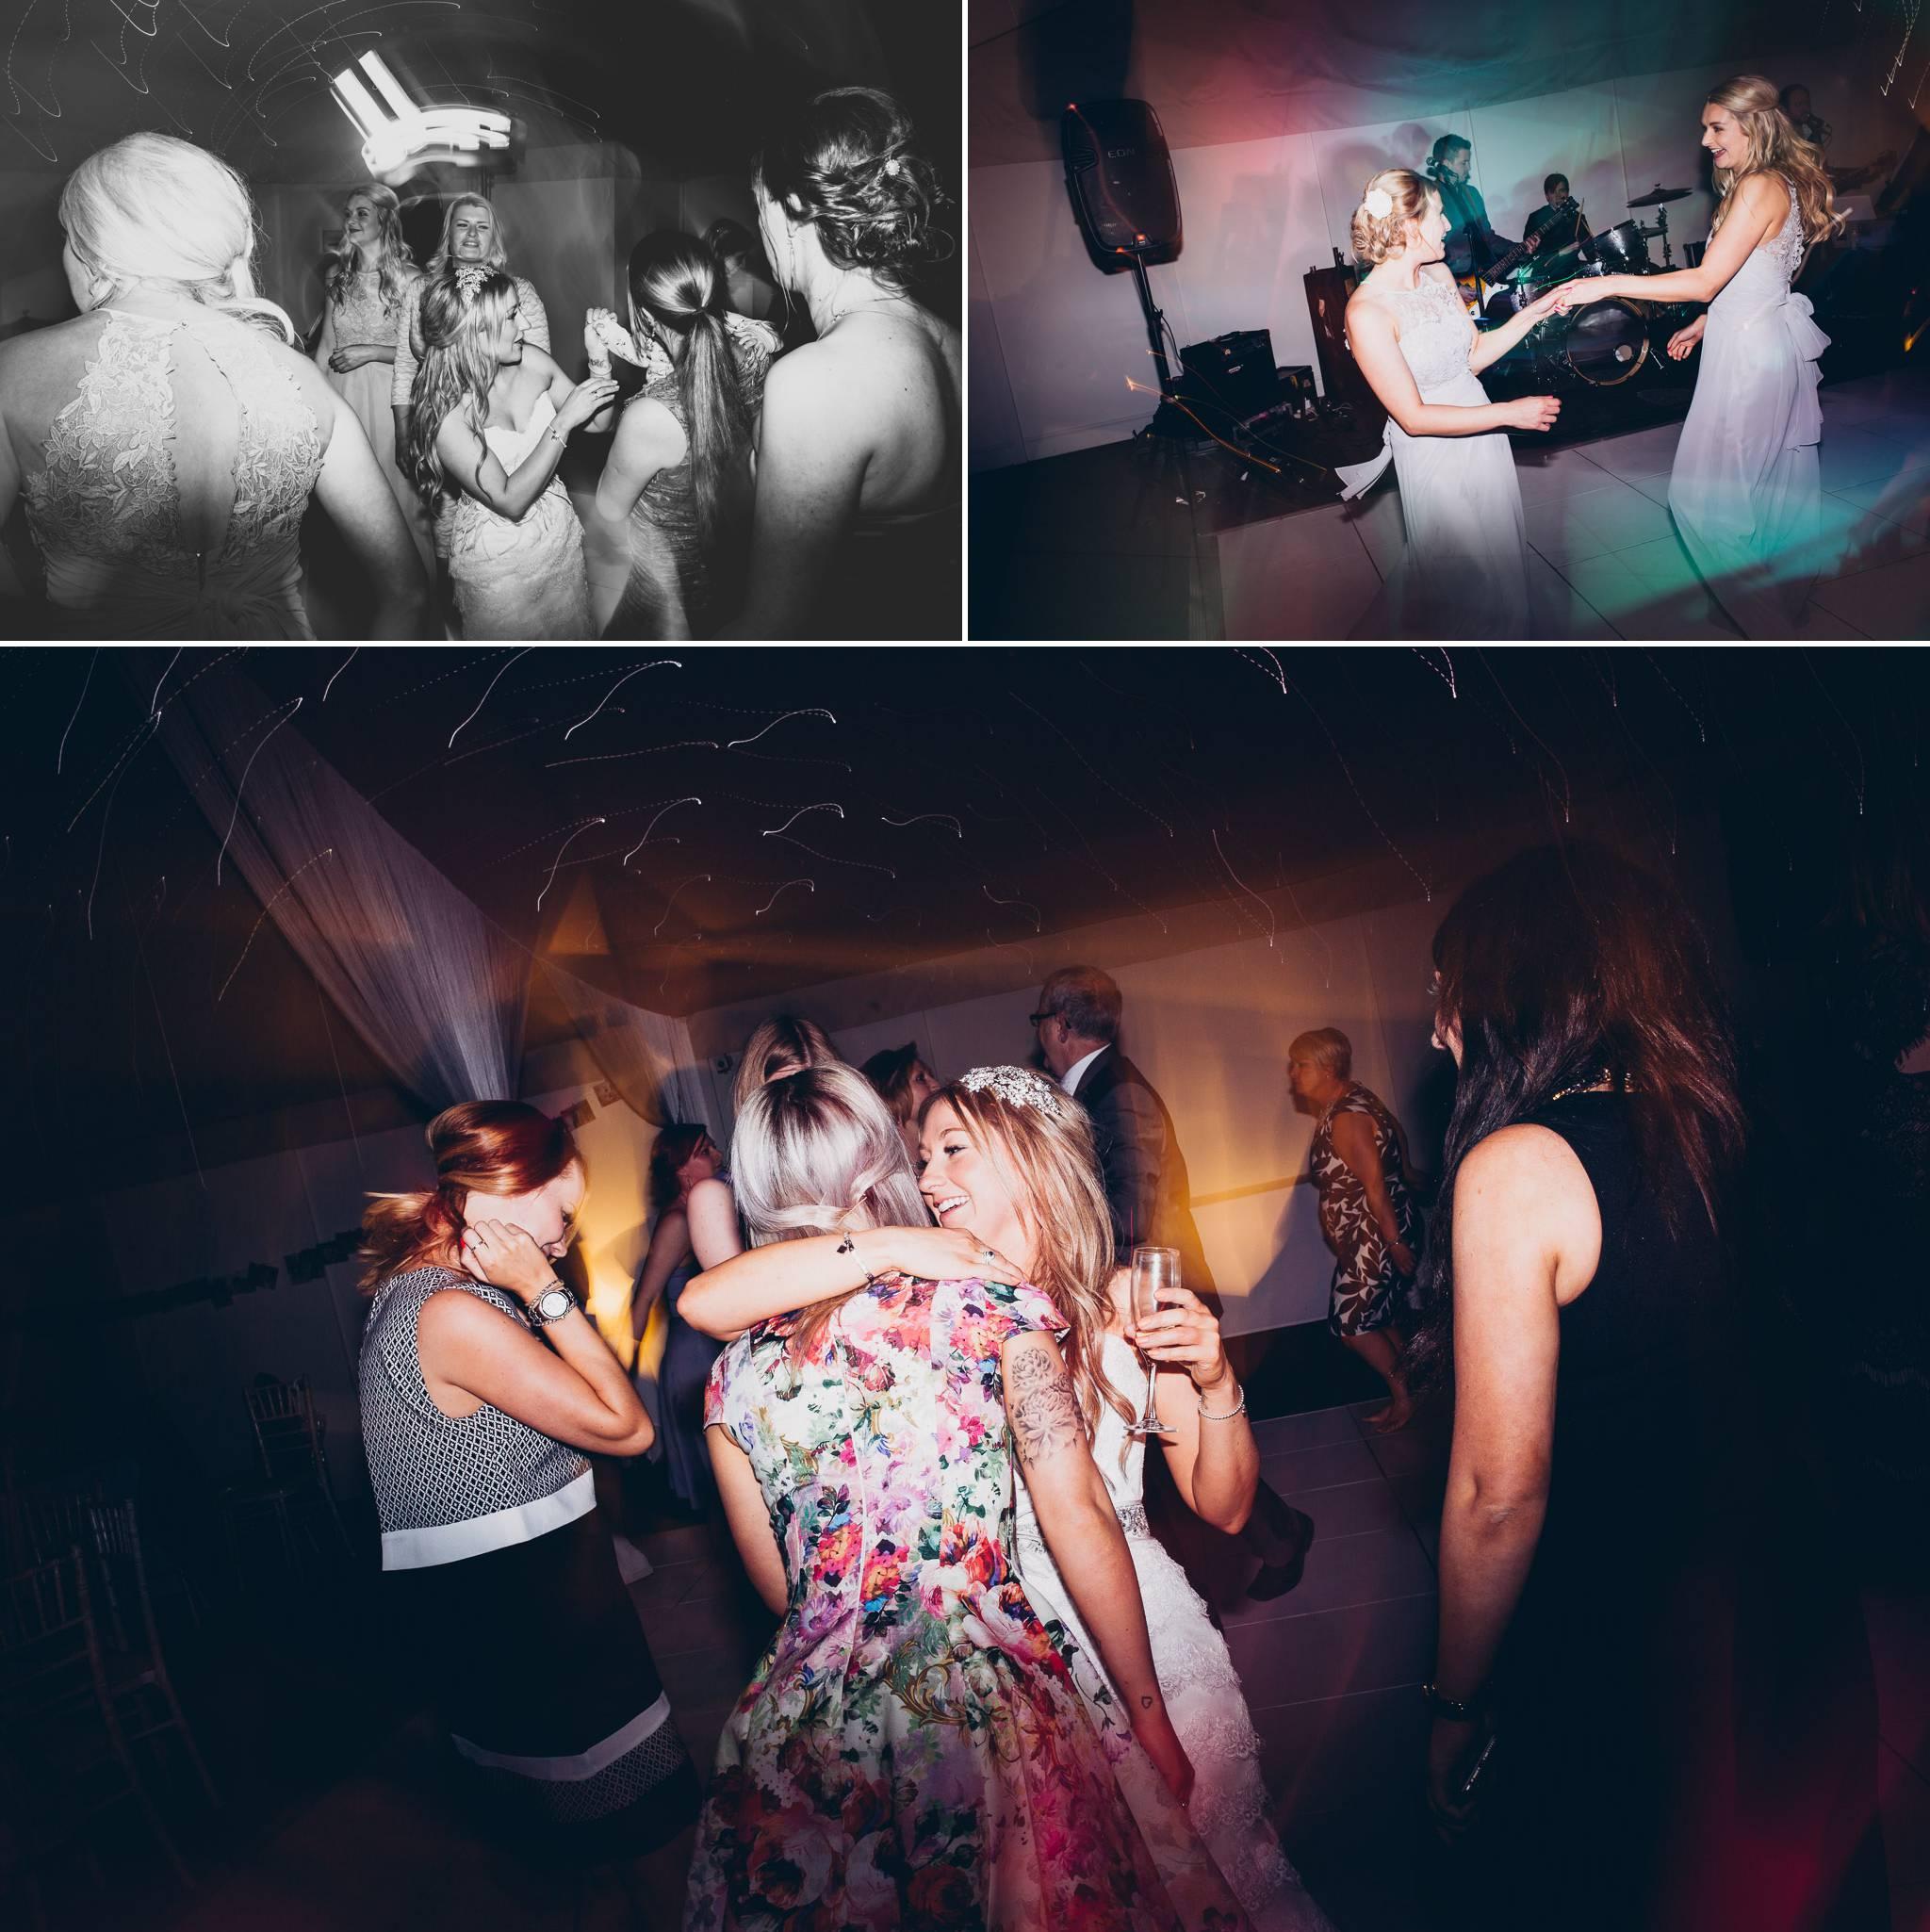 shropshire-wedding-photography 38.jpg